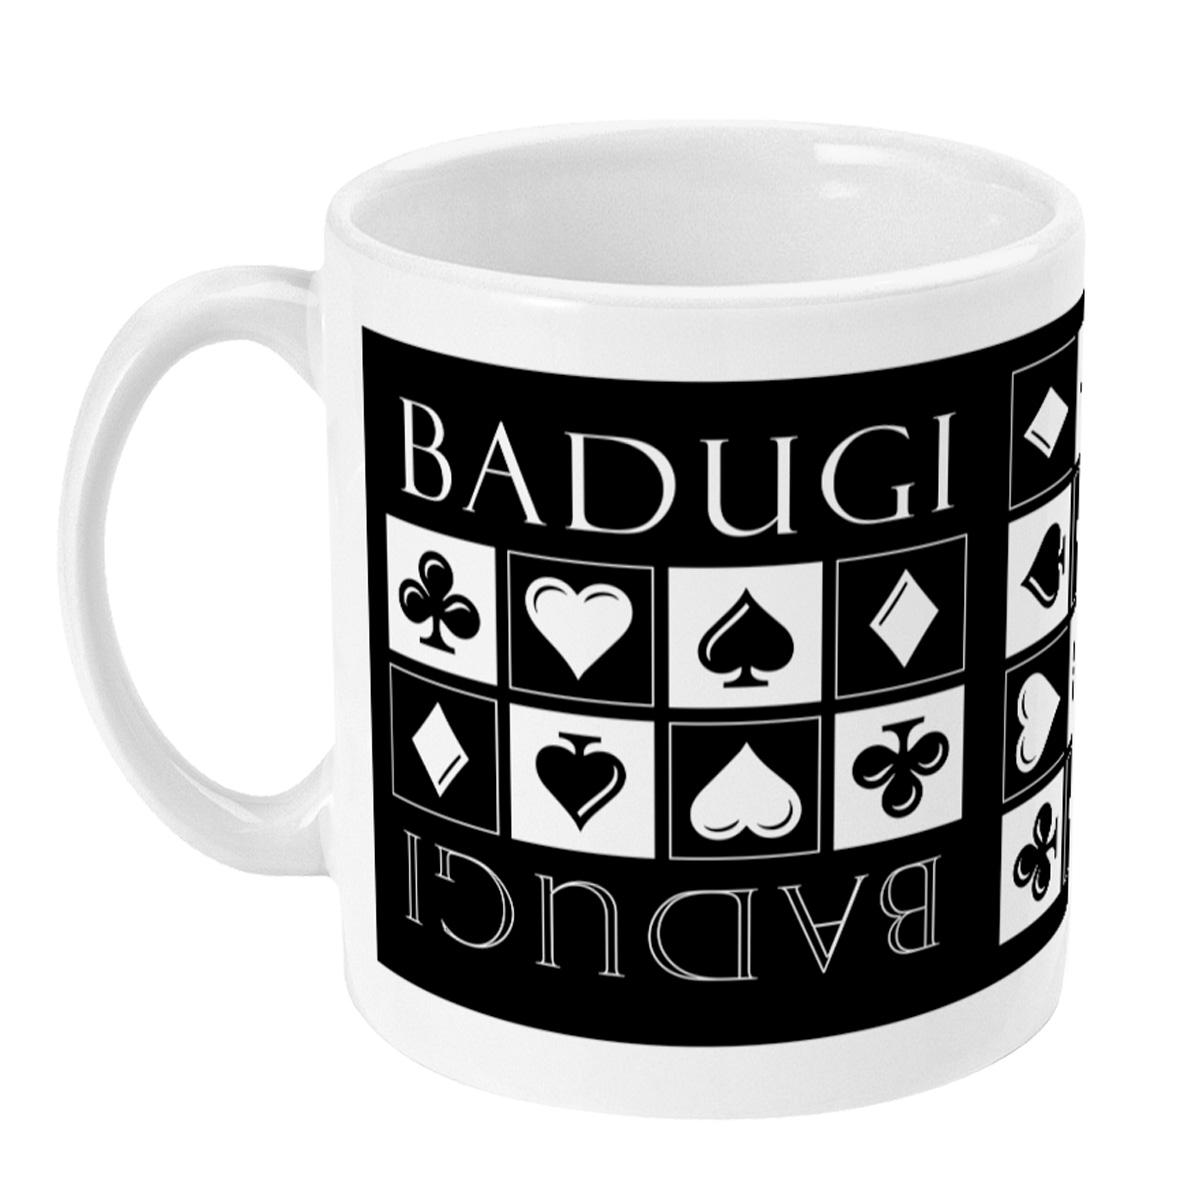 Badugi Poker Mug - Left